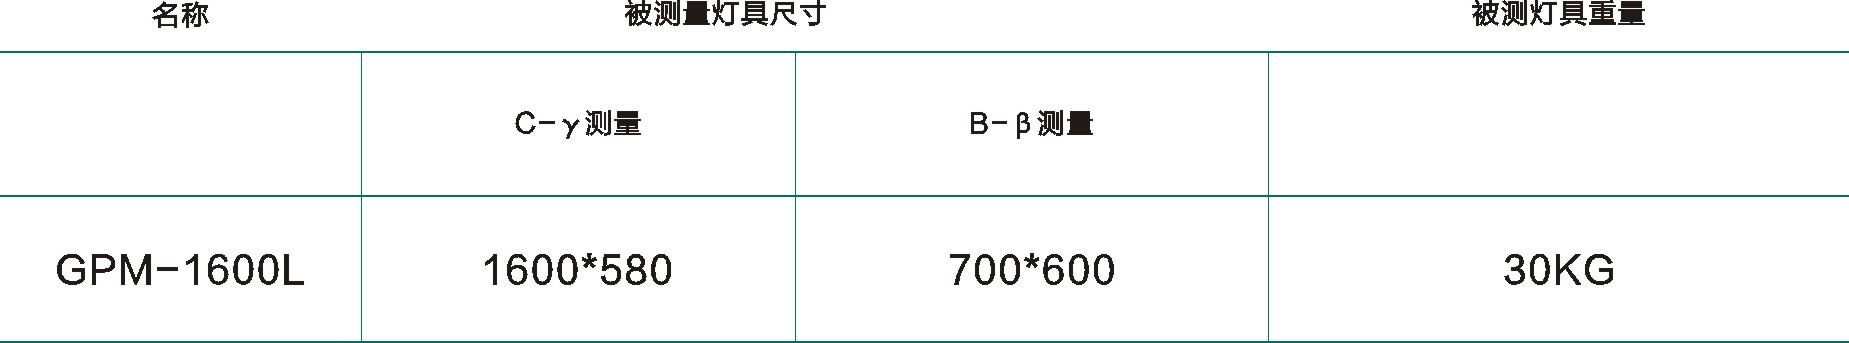 GPM-1600L 分布光度计分类.jpg